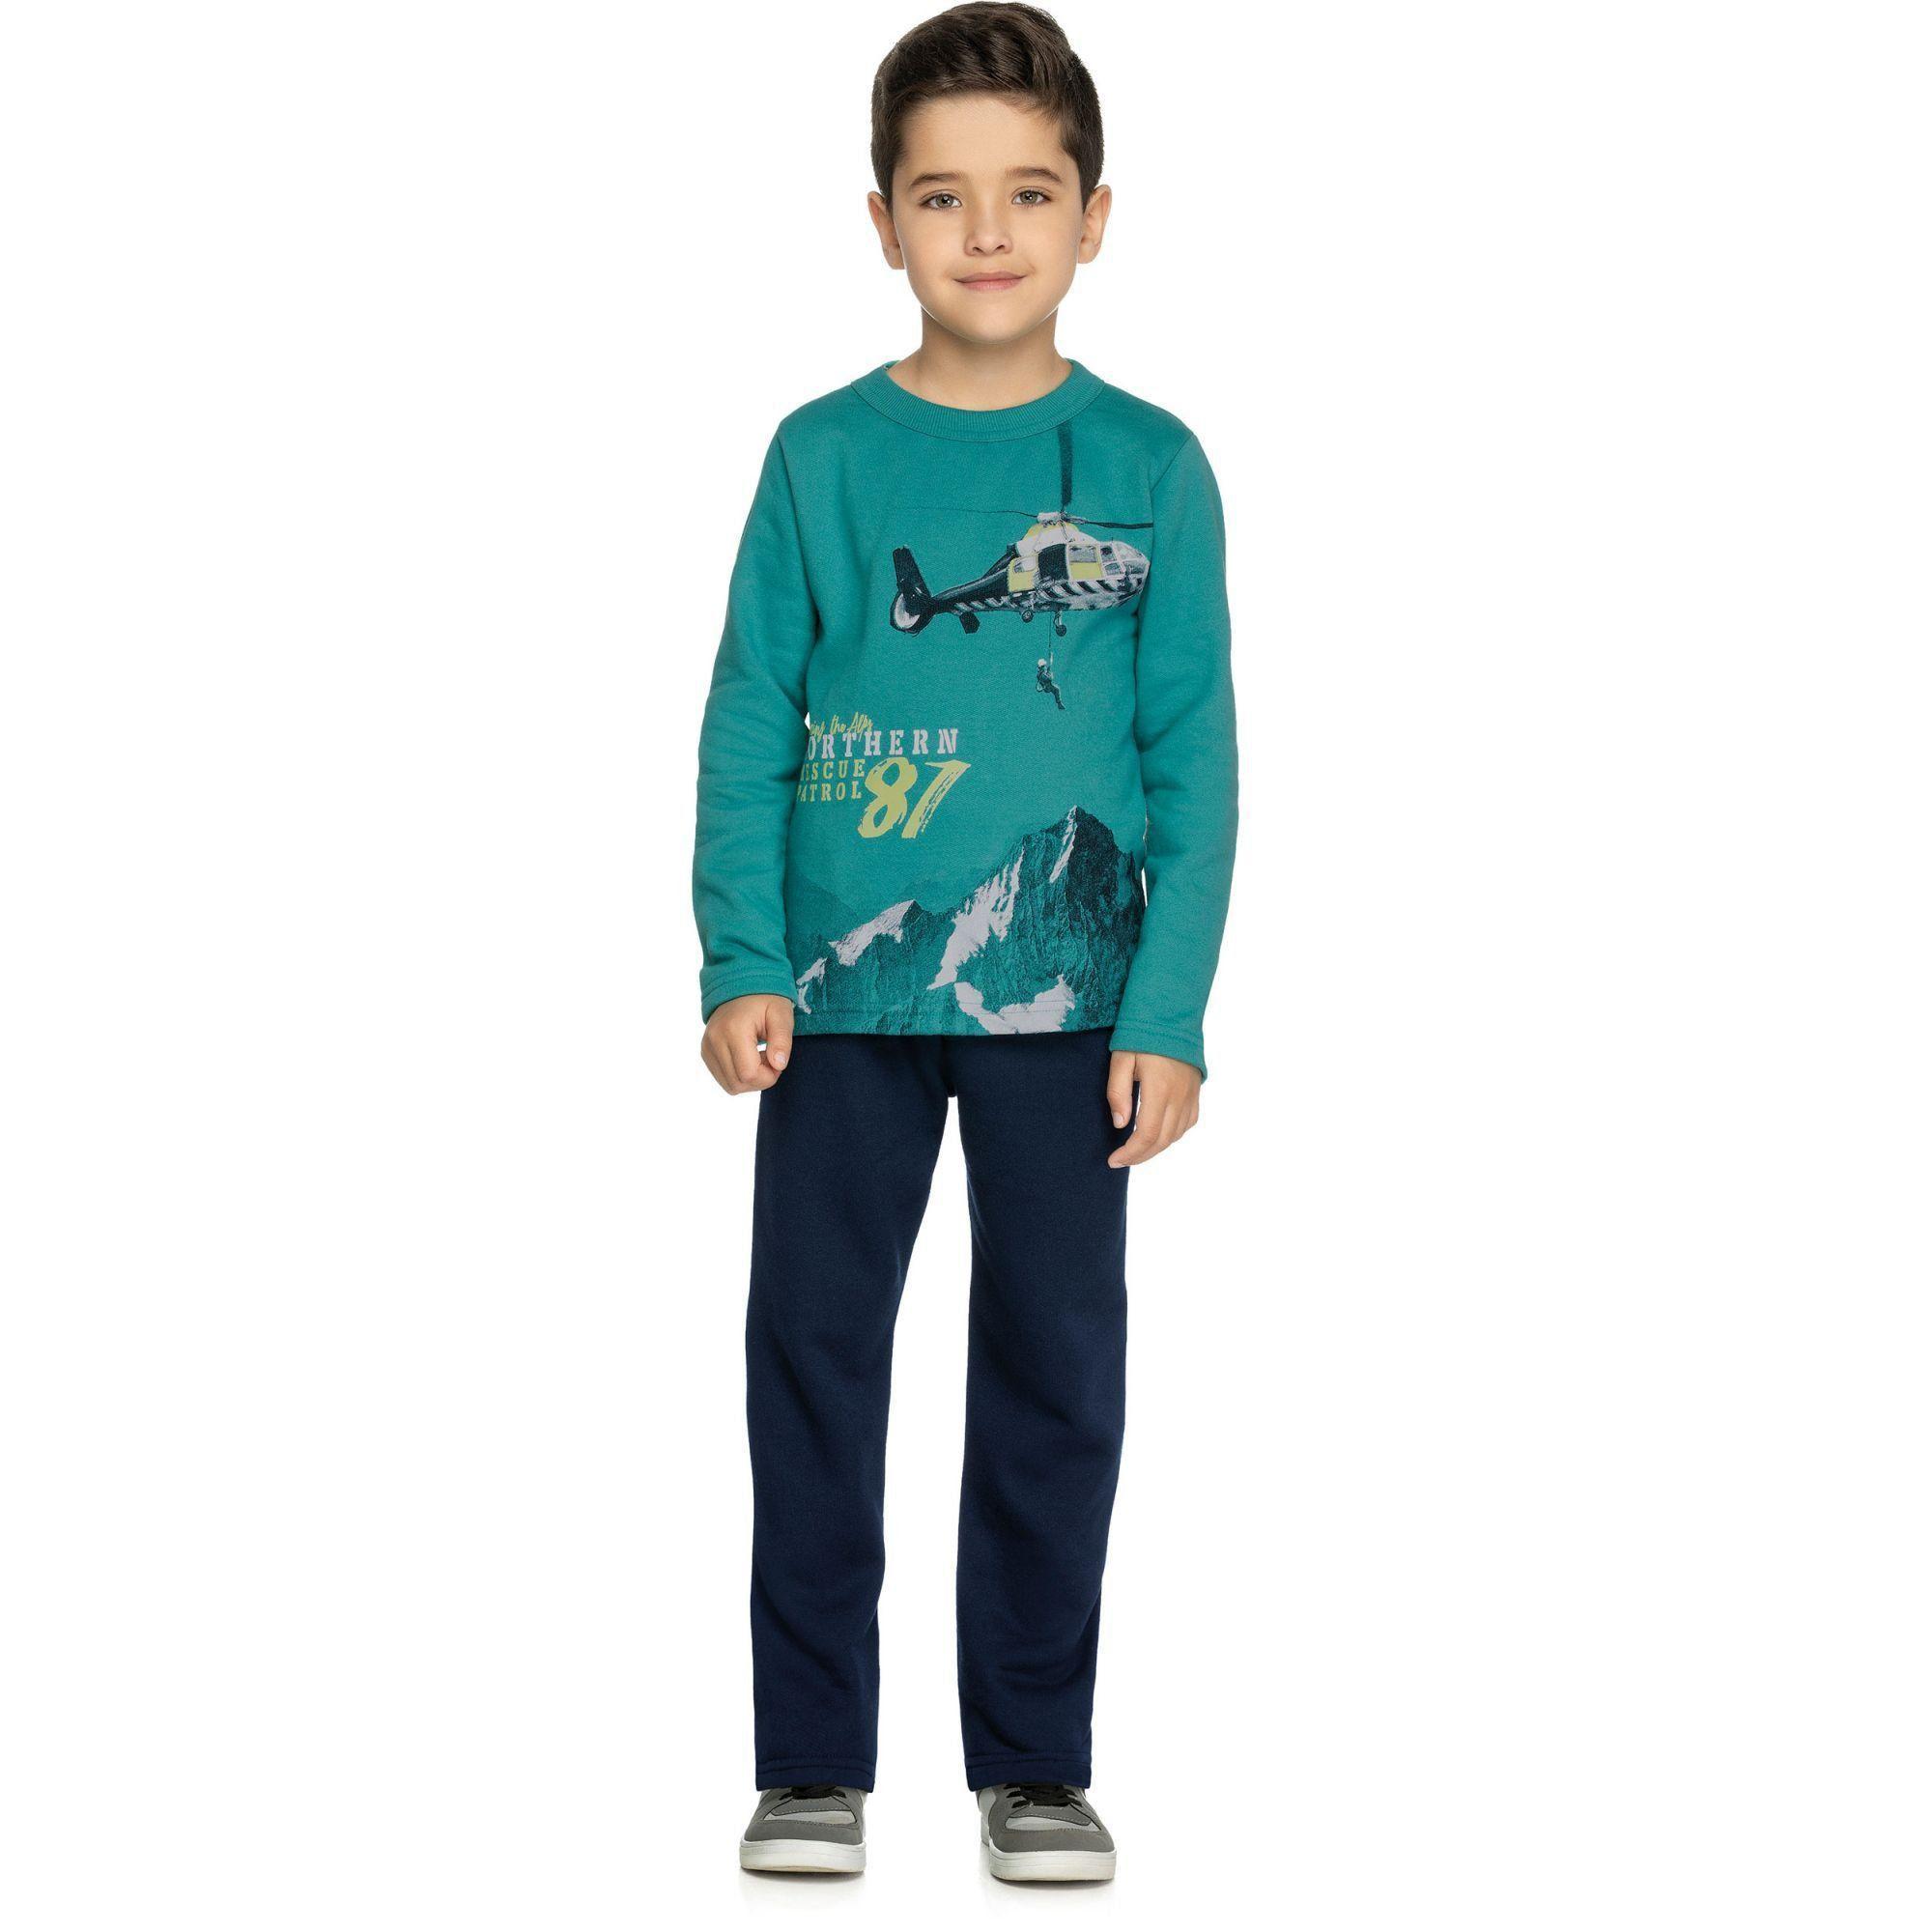 Conjunto Infantil Masculino Inverno Verde Exploring Elian